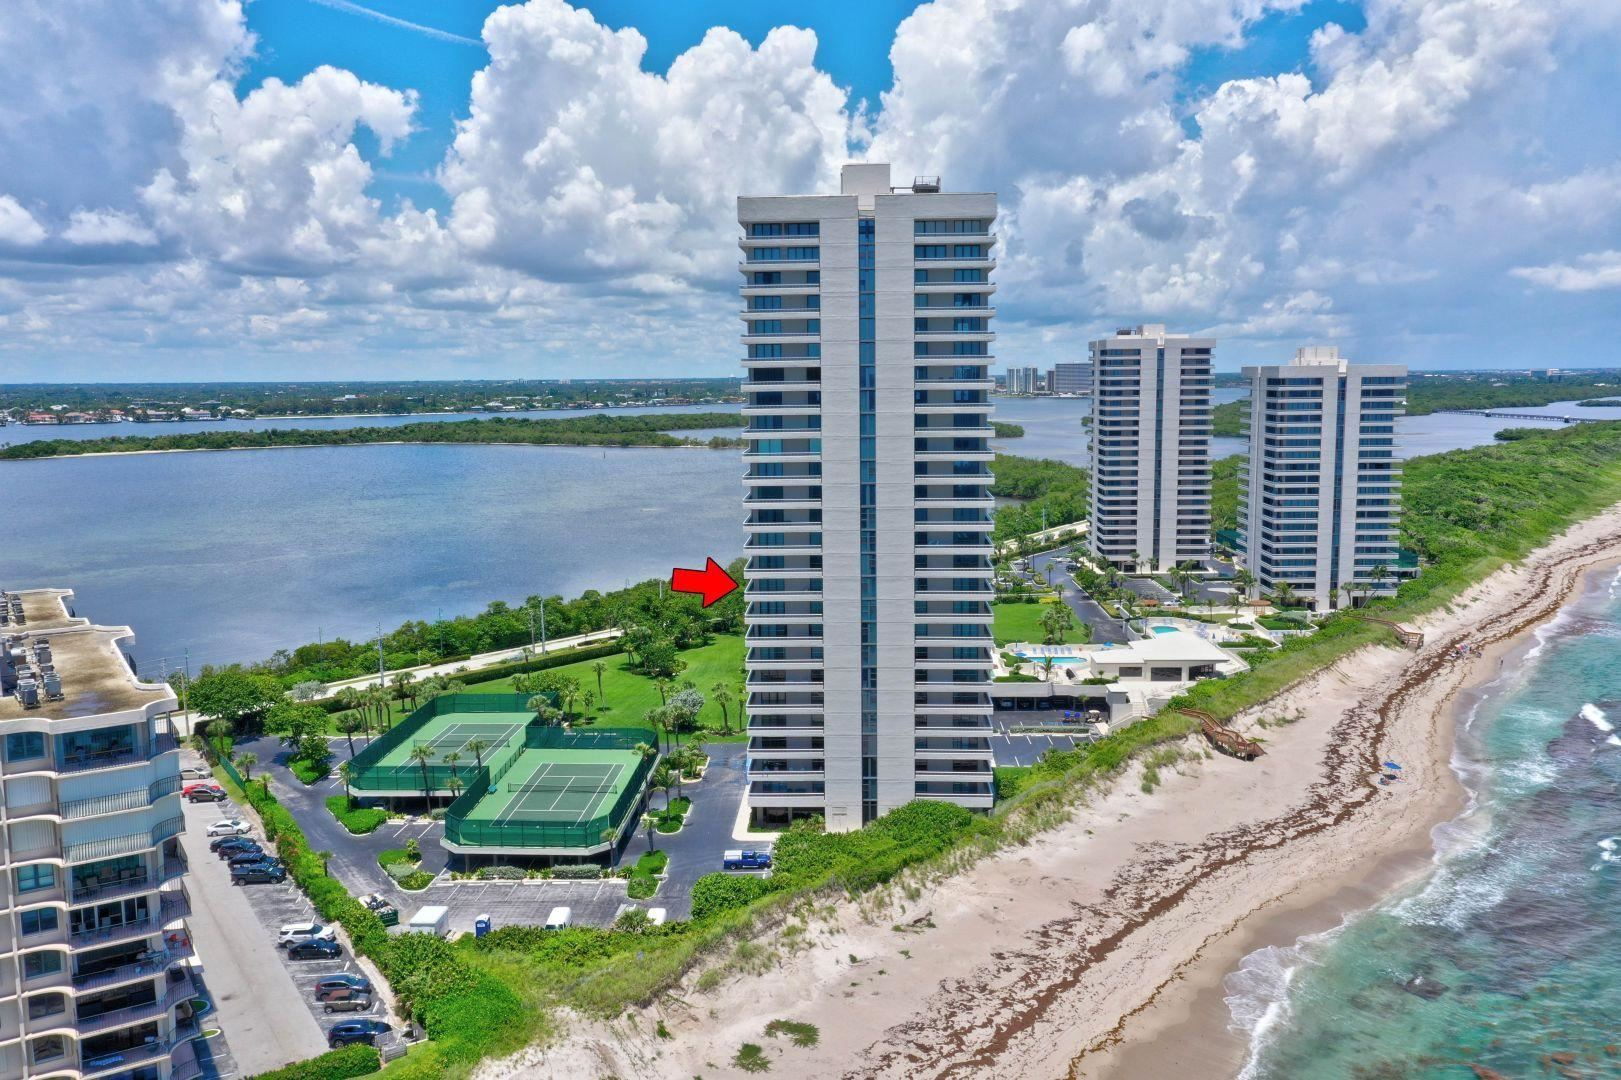 Photo of 5510 N Ocean Drive #11b, Riviera Beach, FL 33404 (MLS # RX-10628165)